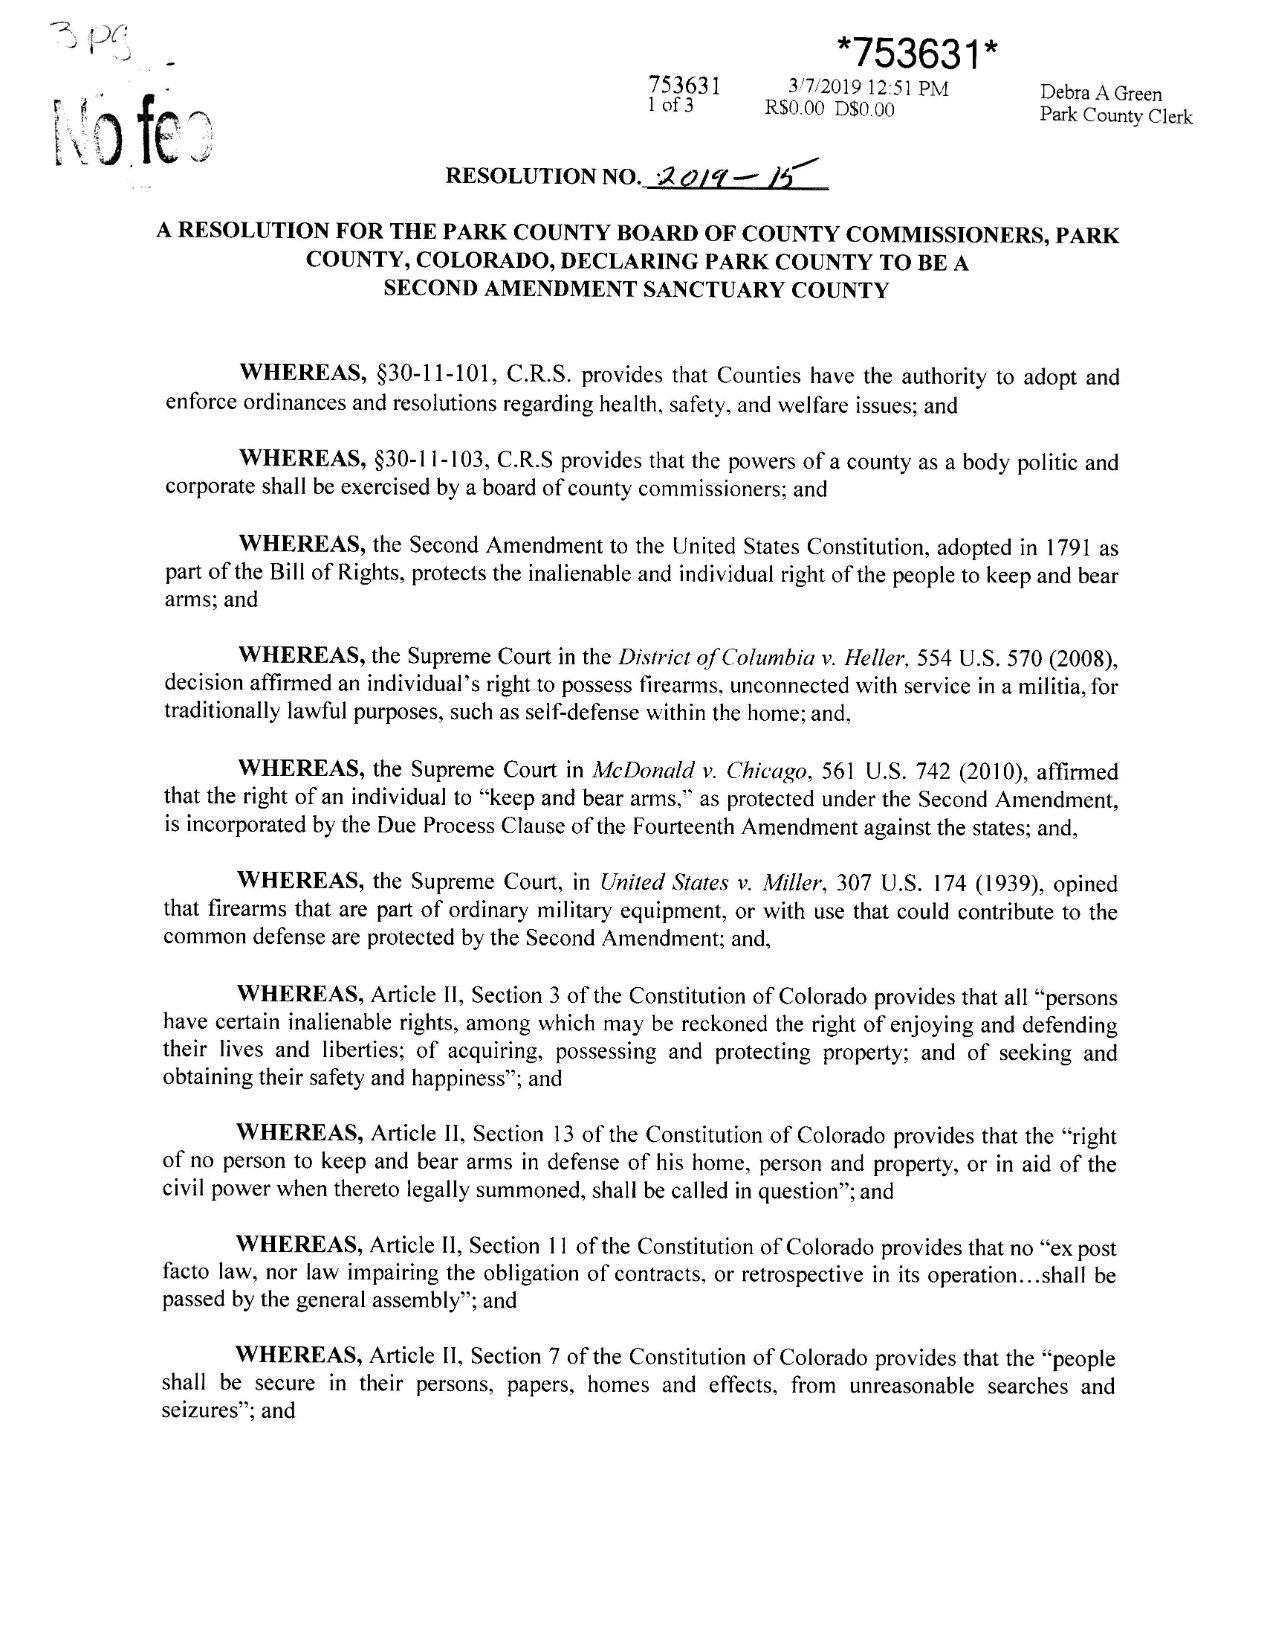 19-15 Declaring Park County Second Amendment Sanctuary County_Page_1